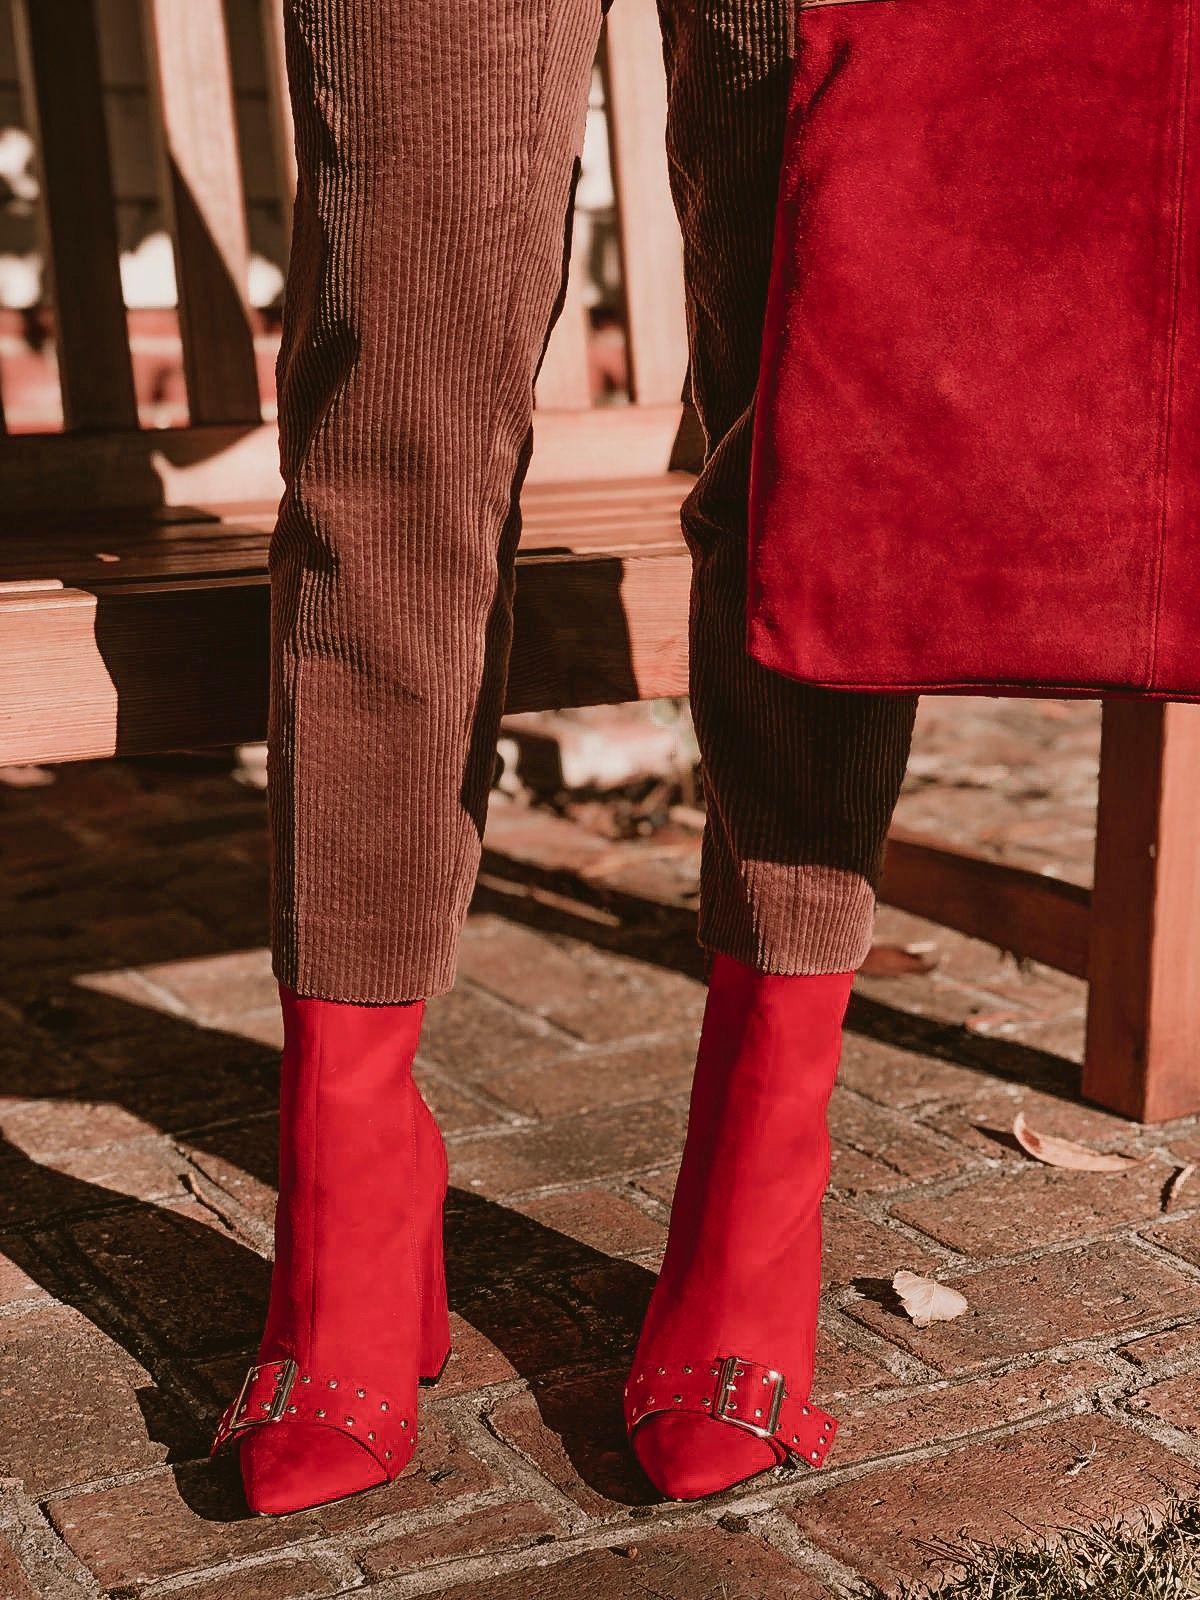 ASOS DESIGN blazer in jumbo cord | ASOS DESIGN slim trouser in jumbo cord | Boohoo Buckle Detail Heeled Boot | ASOS DESIGN suede tote bag with square handle detail | Elegant Duchess Boutique Brooch | Swarovski Hoop earrings